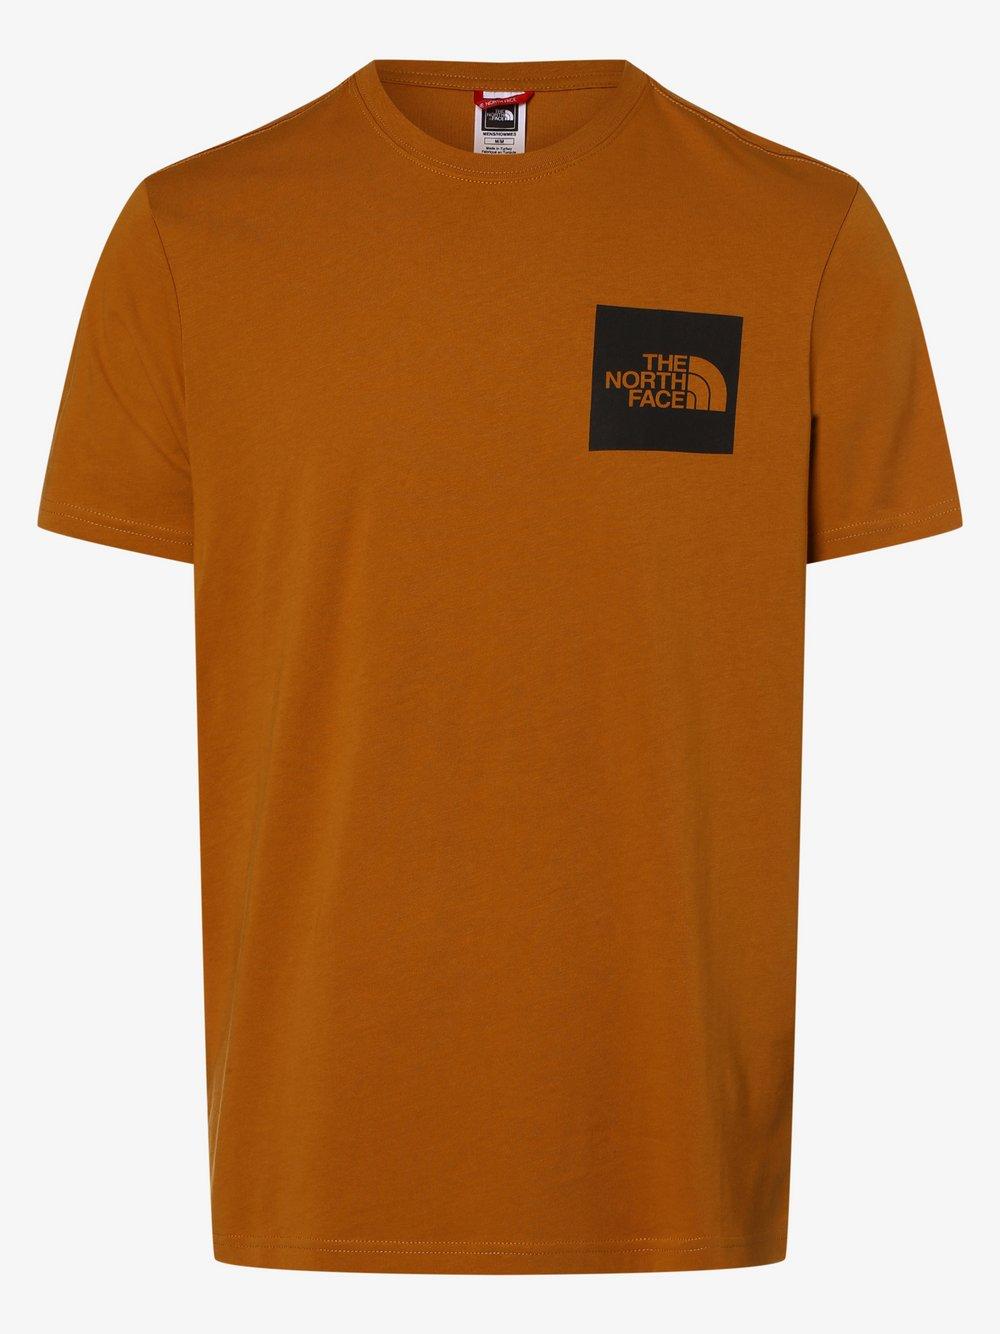 The North Face - T-shirt męski, szary